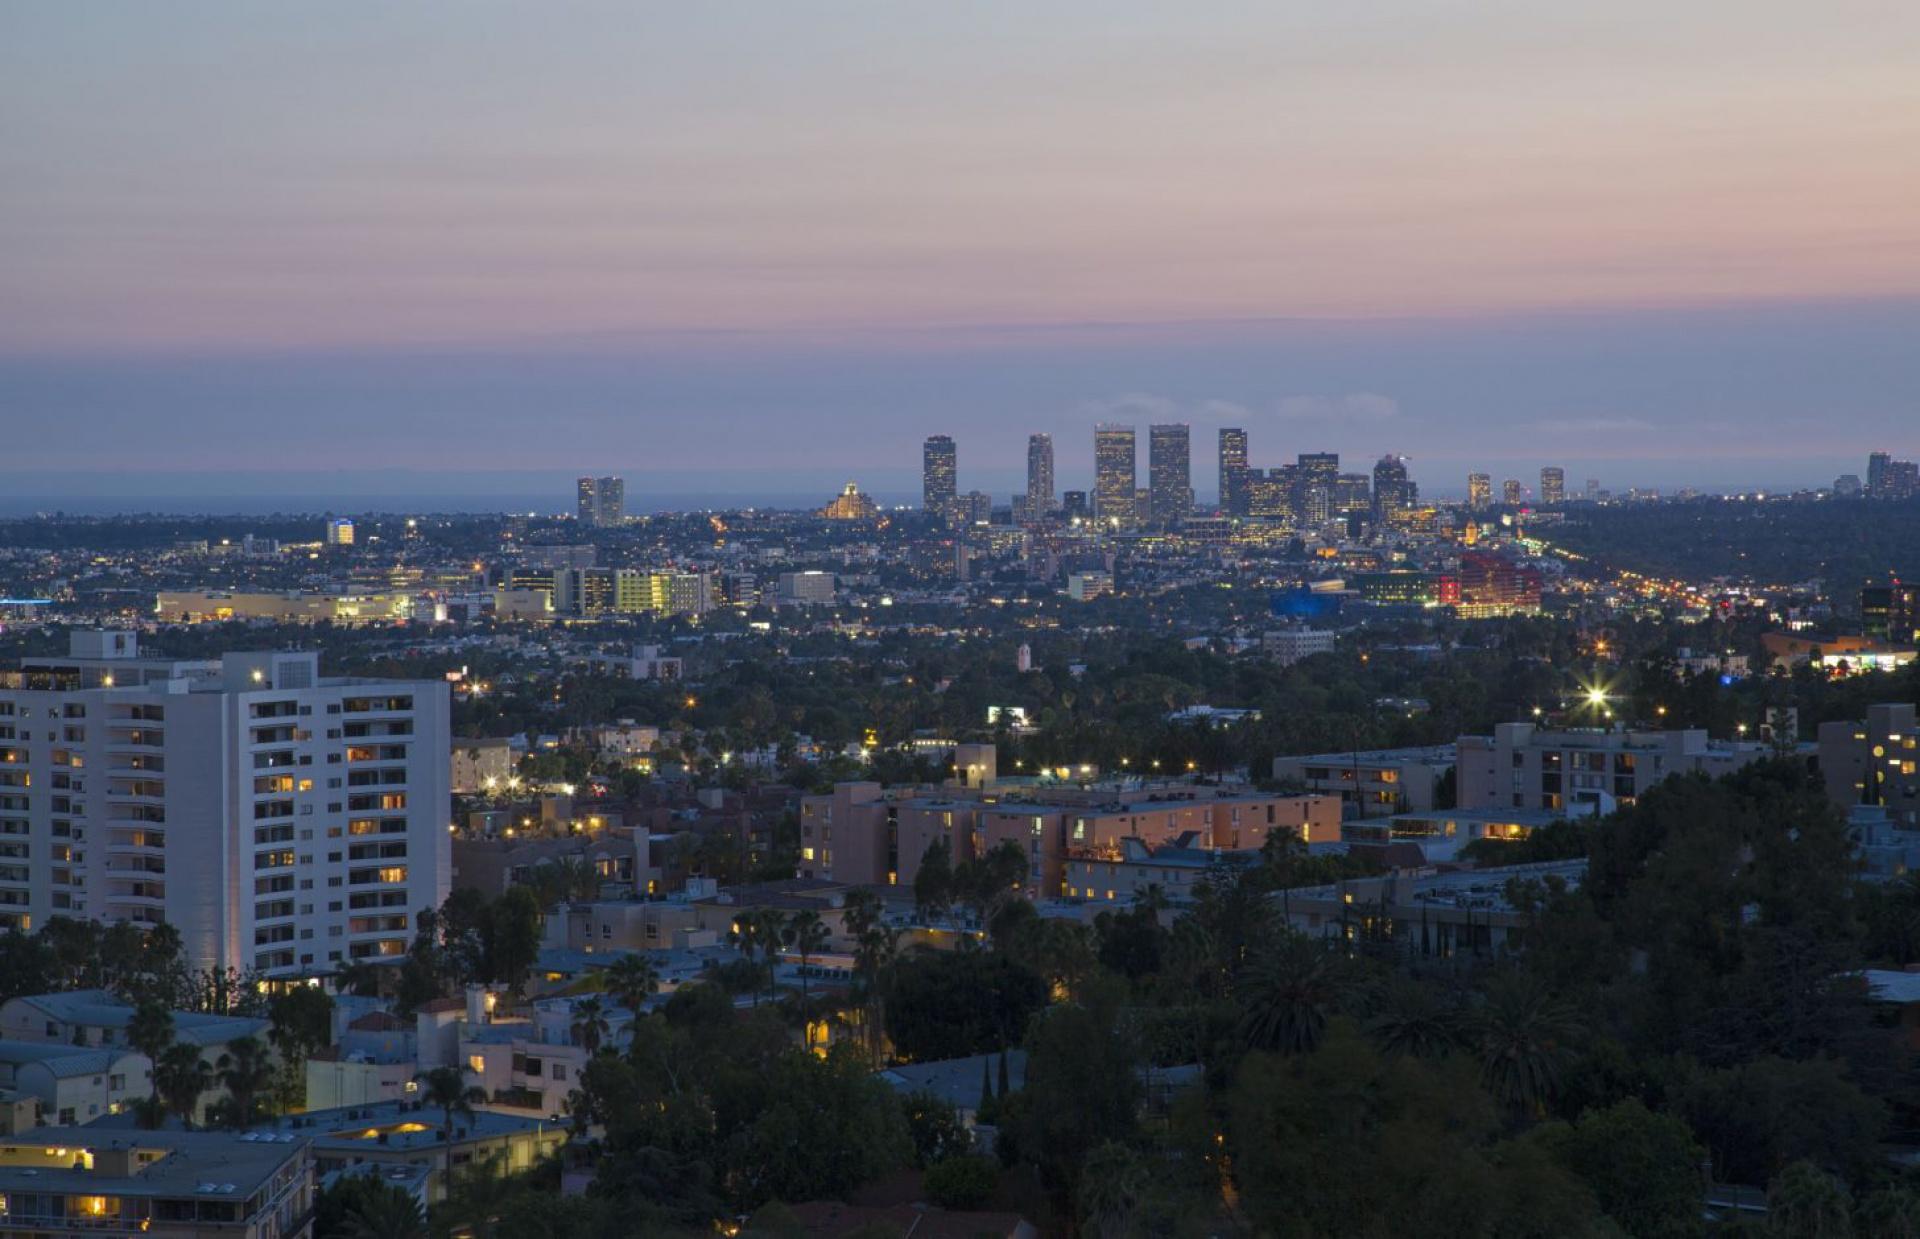 7100 La Presa   |   Outpost Estates Los Angeles CA  | Jonah Wilson